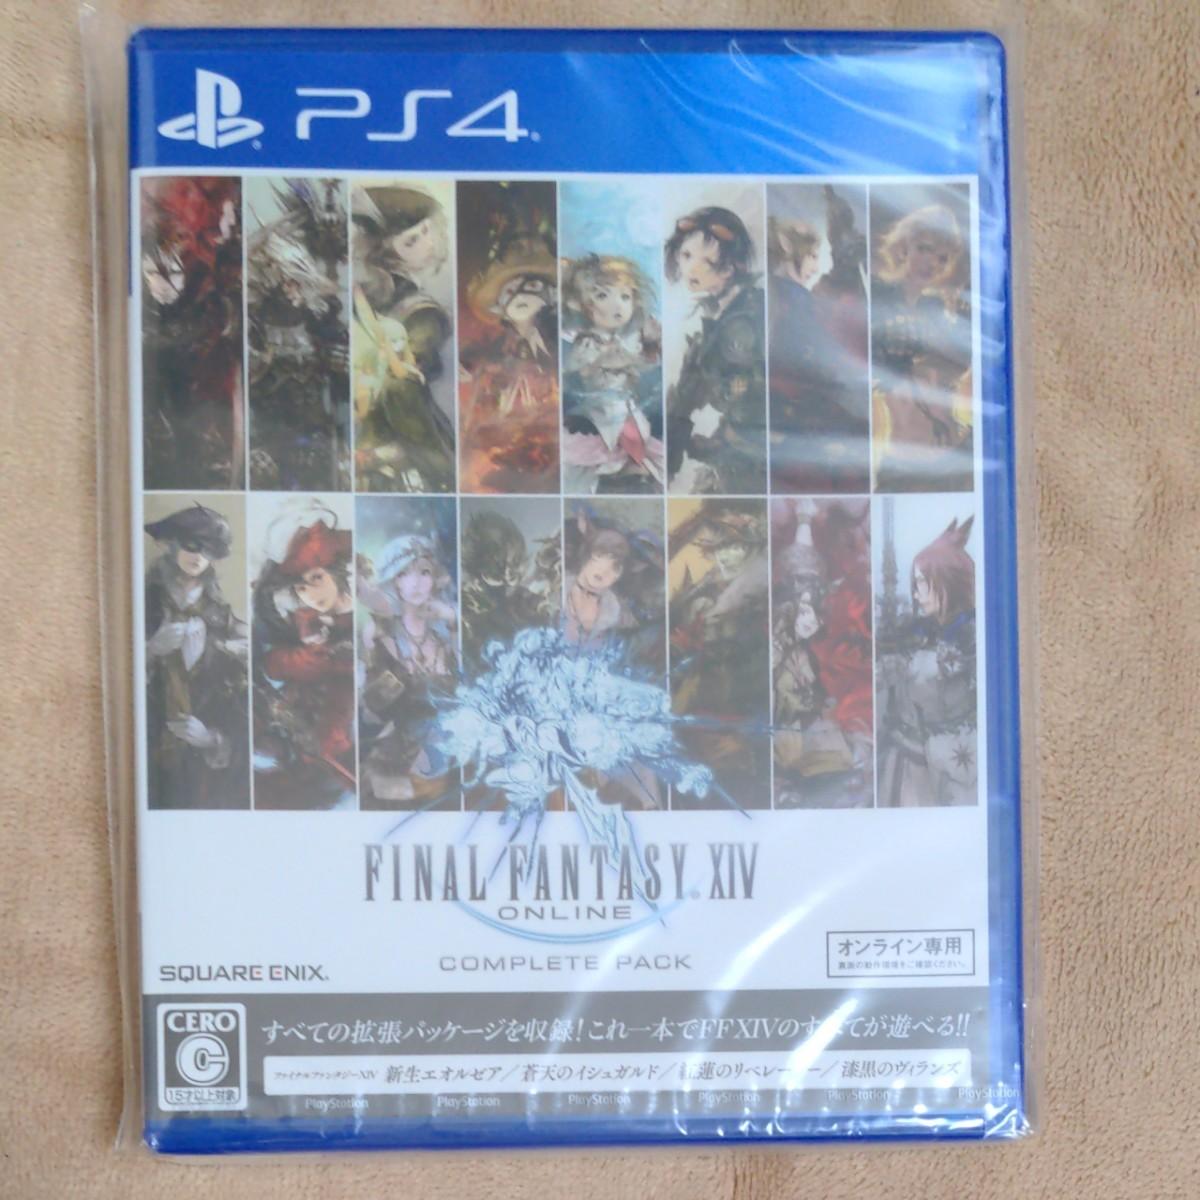 【PS4】 ファイナルファンタジーXIV コンプリートパック [新生エオルゼア~漆黒のヴィランズ] 30日無料期間付き